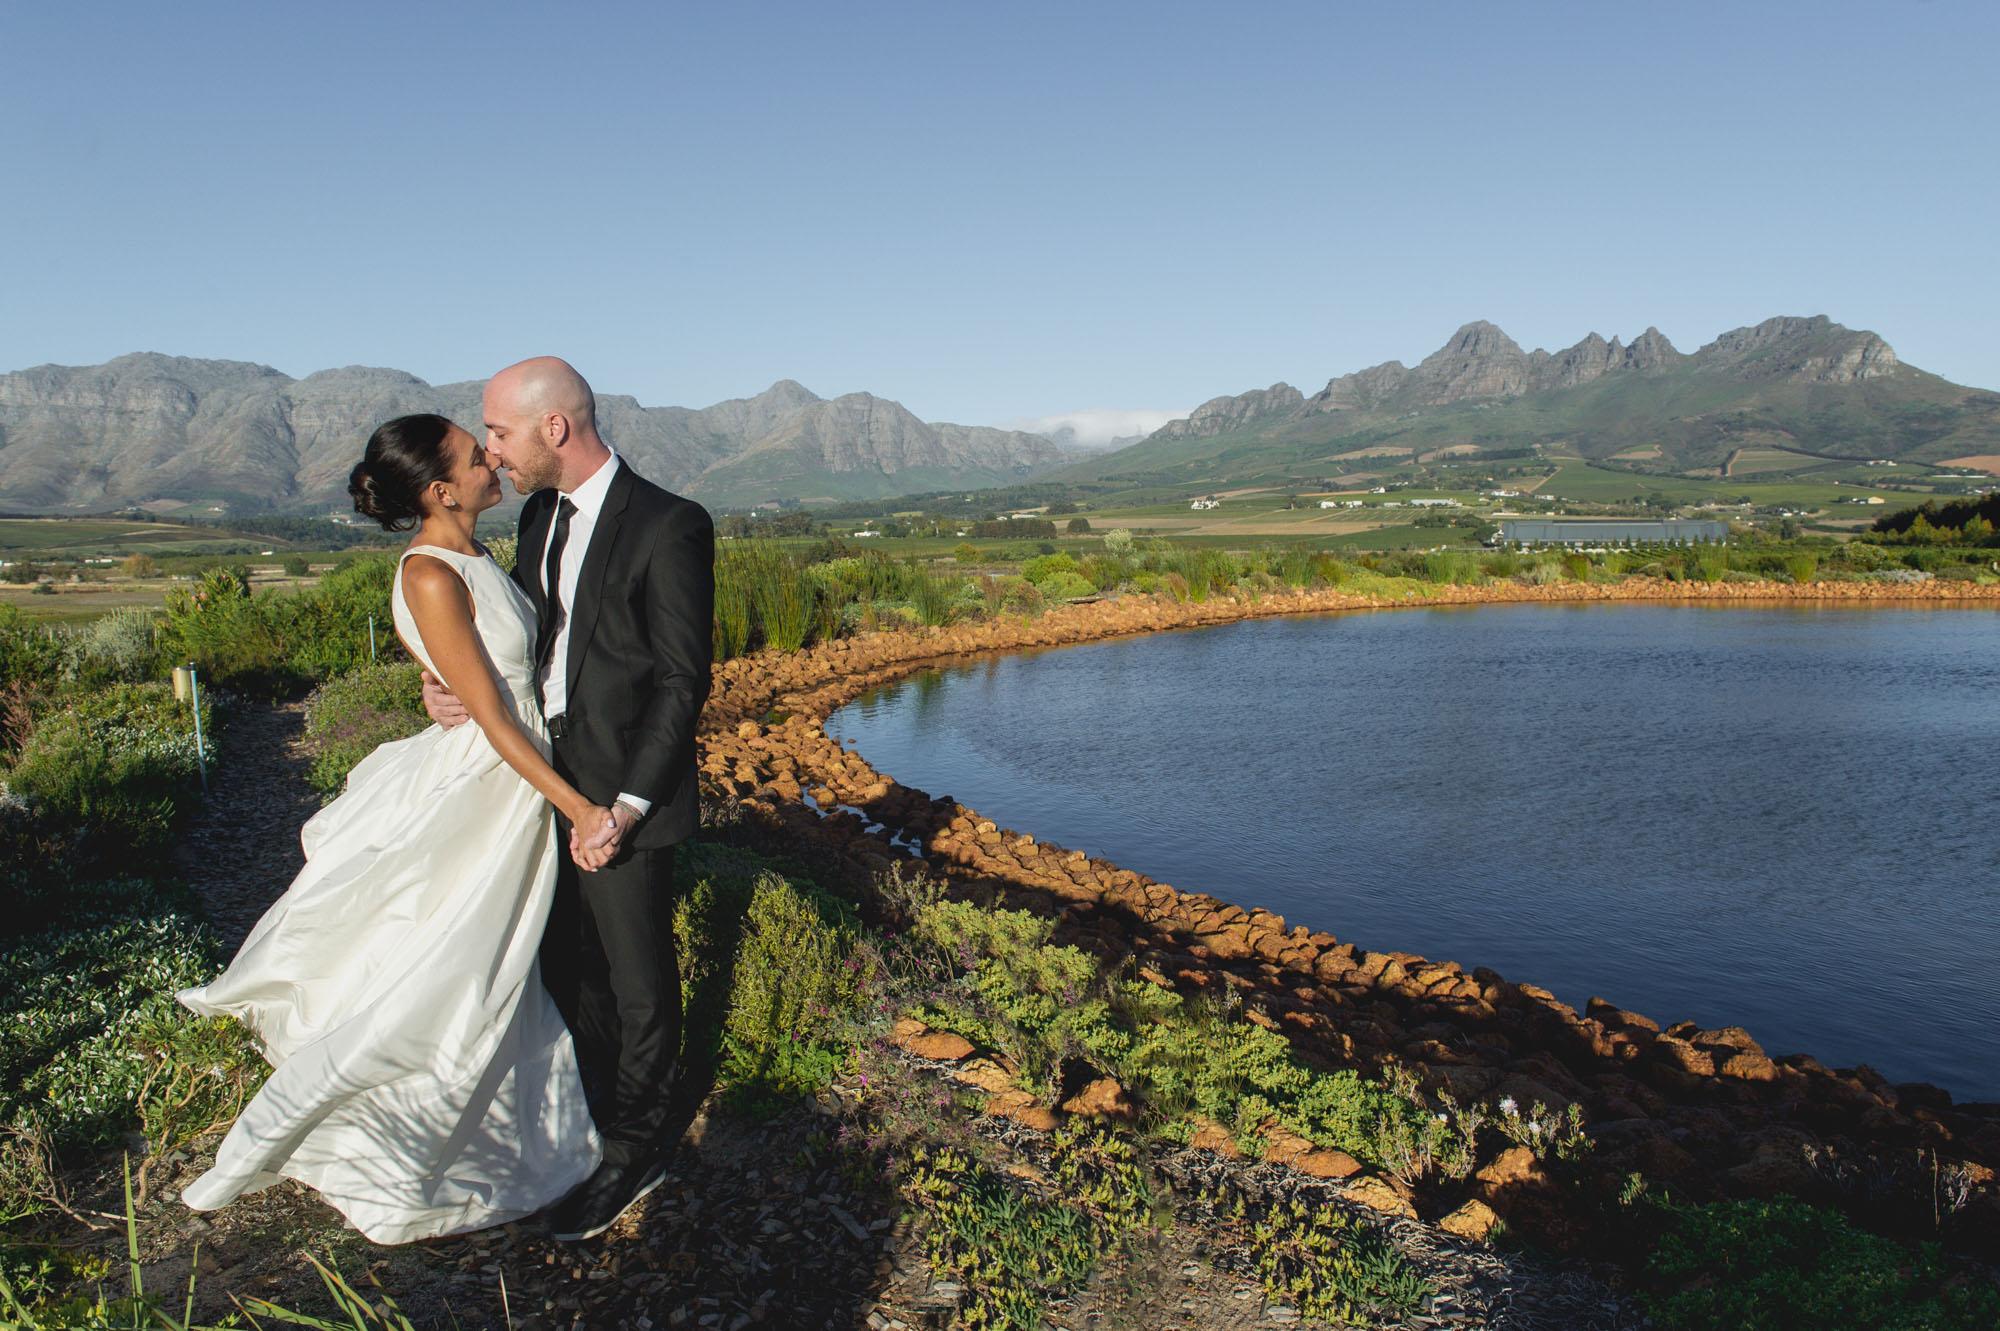 john-henry-wedding-photographer-kiara-ashley-001-18.jpg